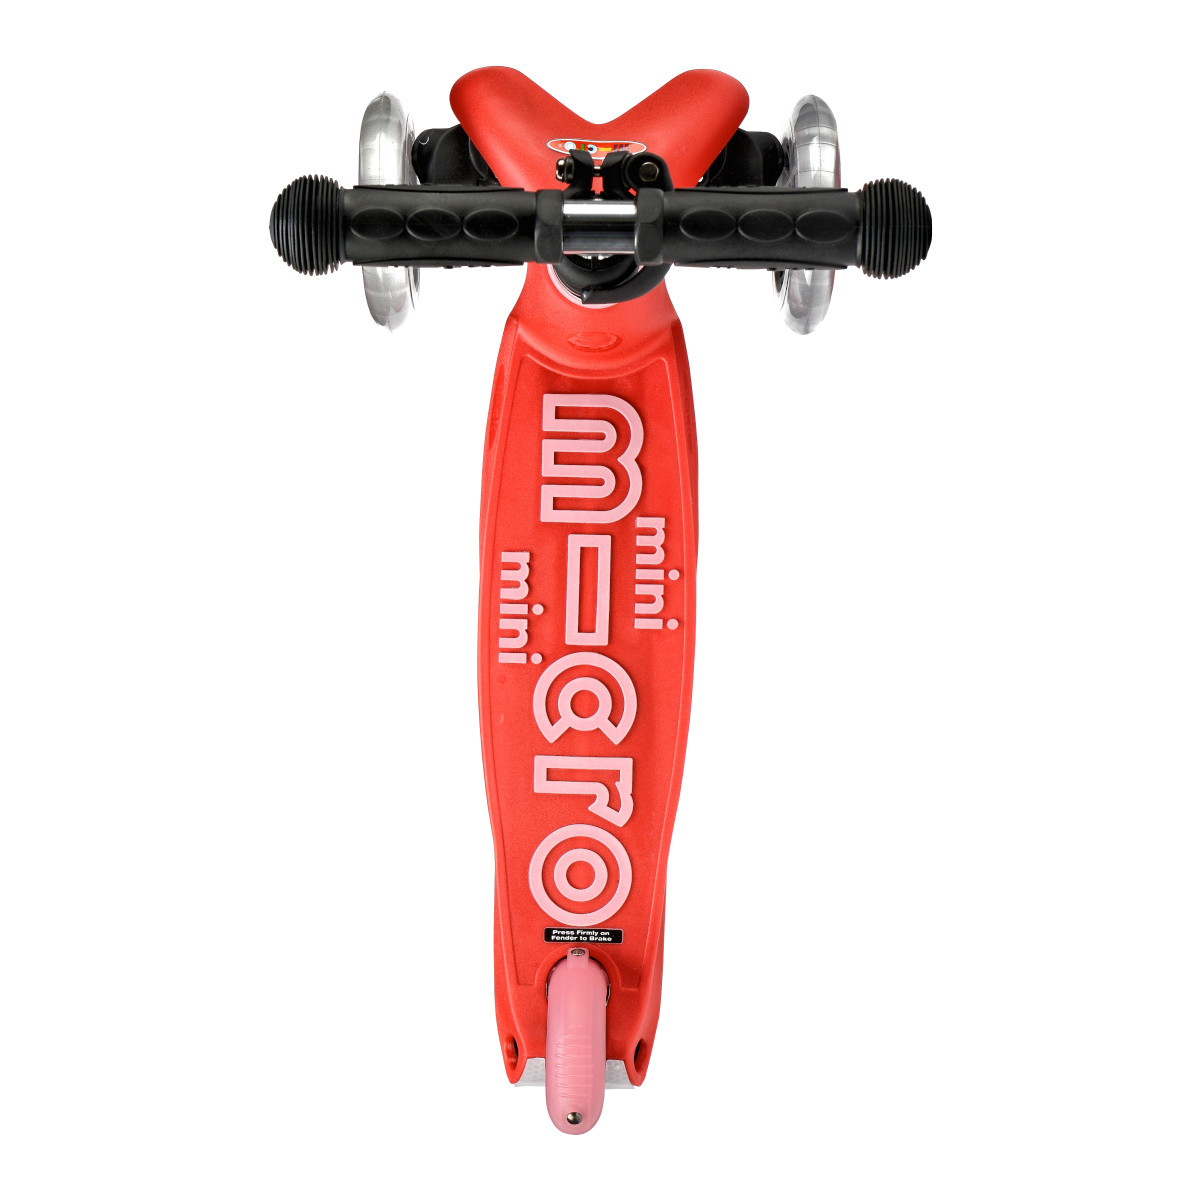 Micro Mini2go Deluxe Plus Red - 06